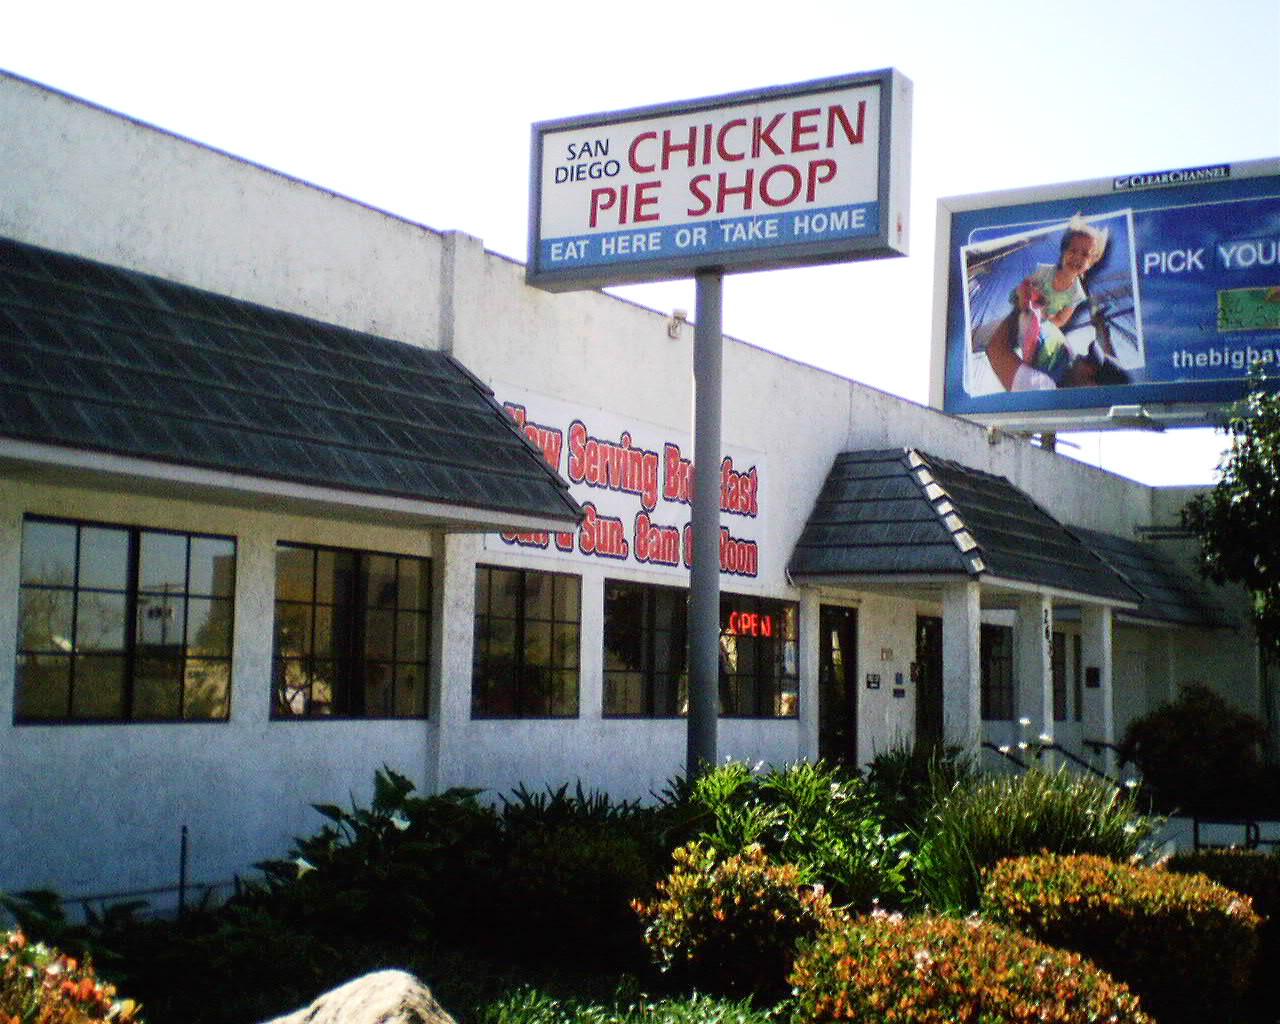 Chicken Pie Shop  The e and ly Chicken Pie Shop